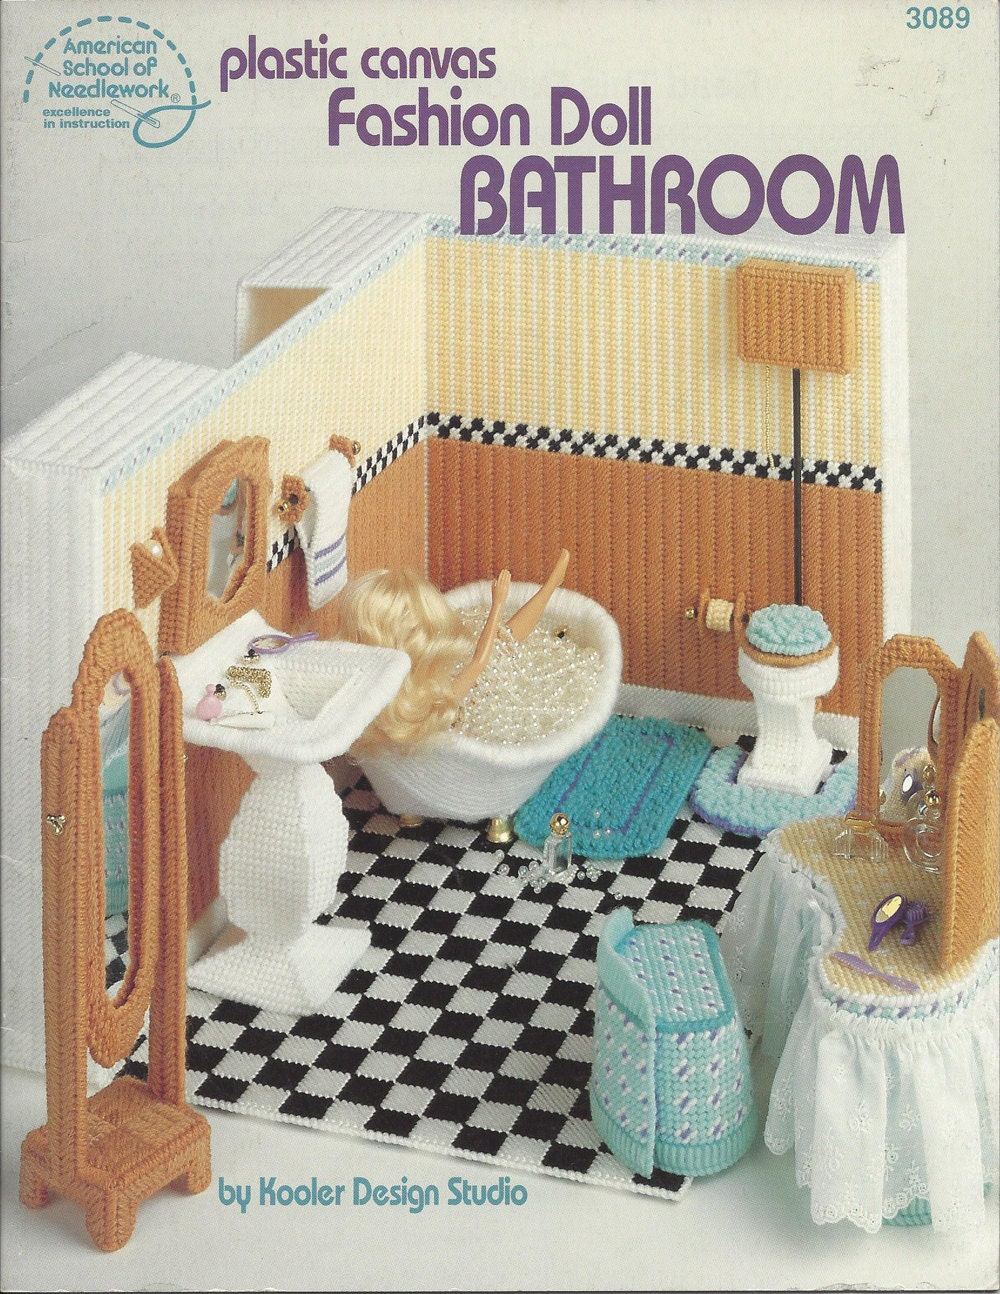 Plastic canvas fashion doll furniture patterns 51